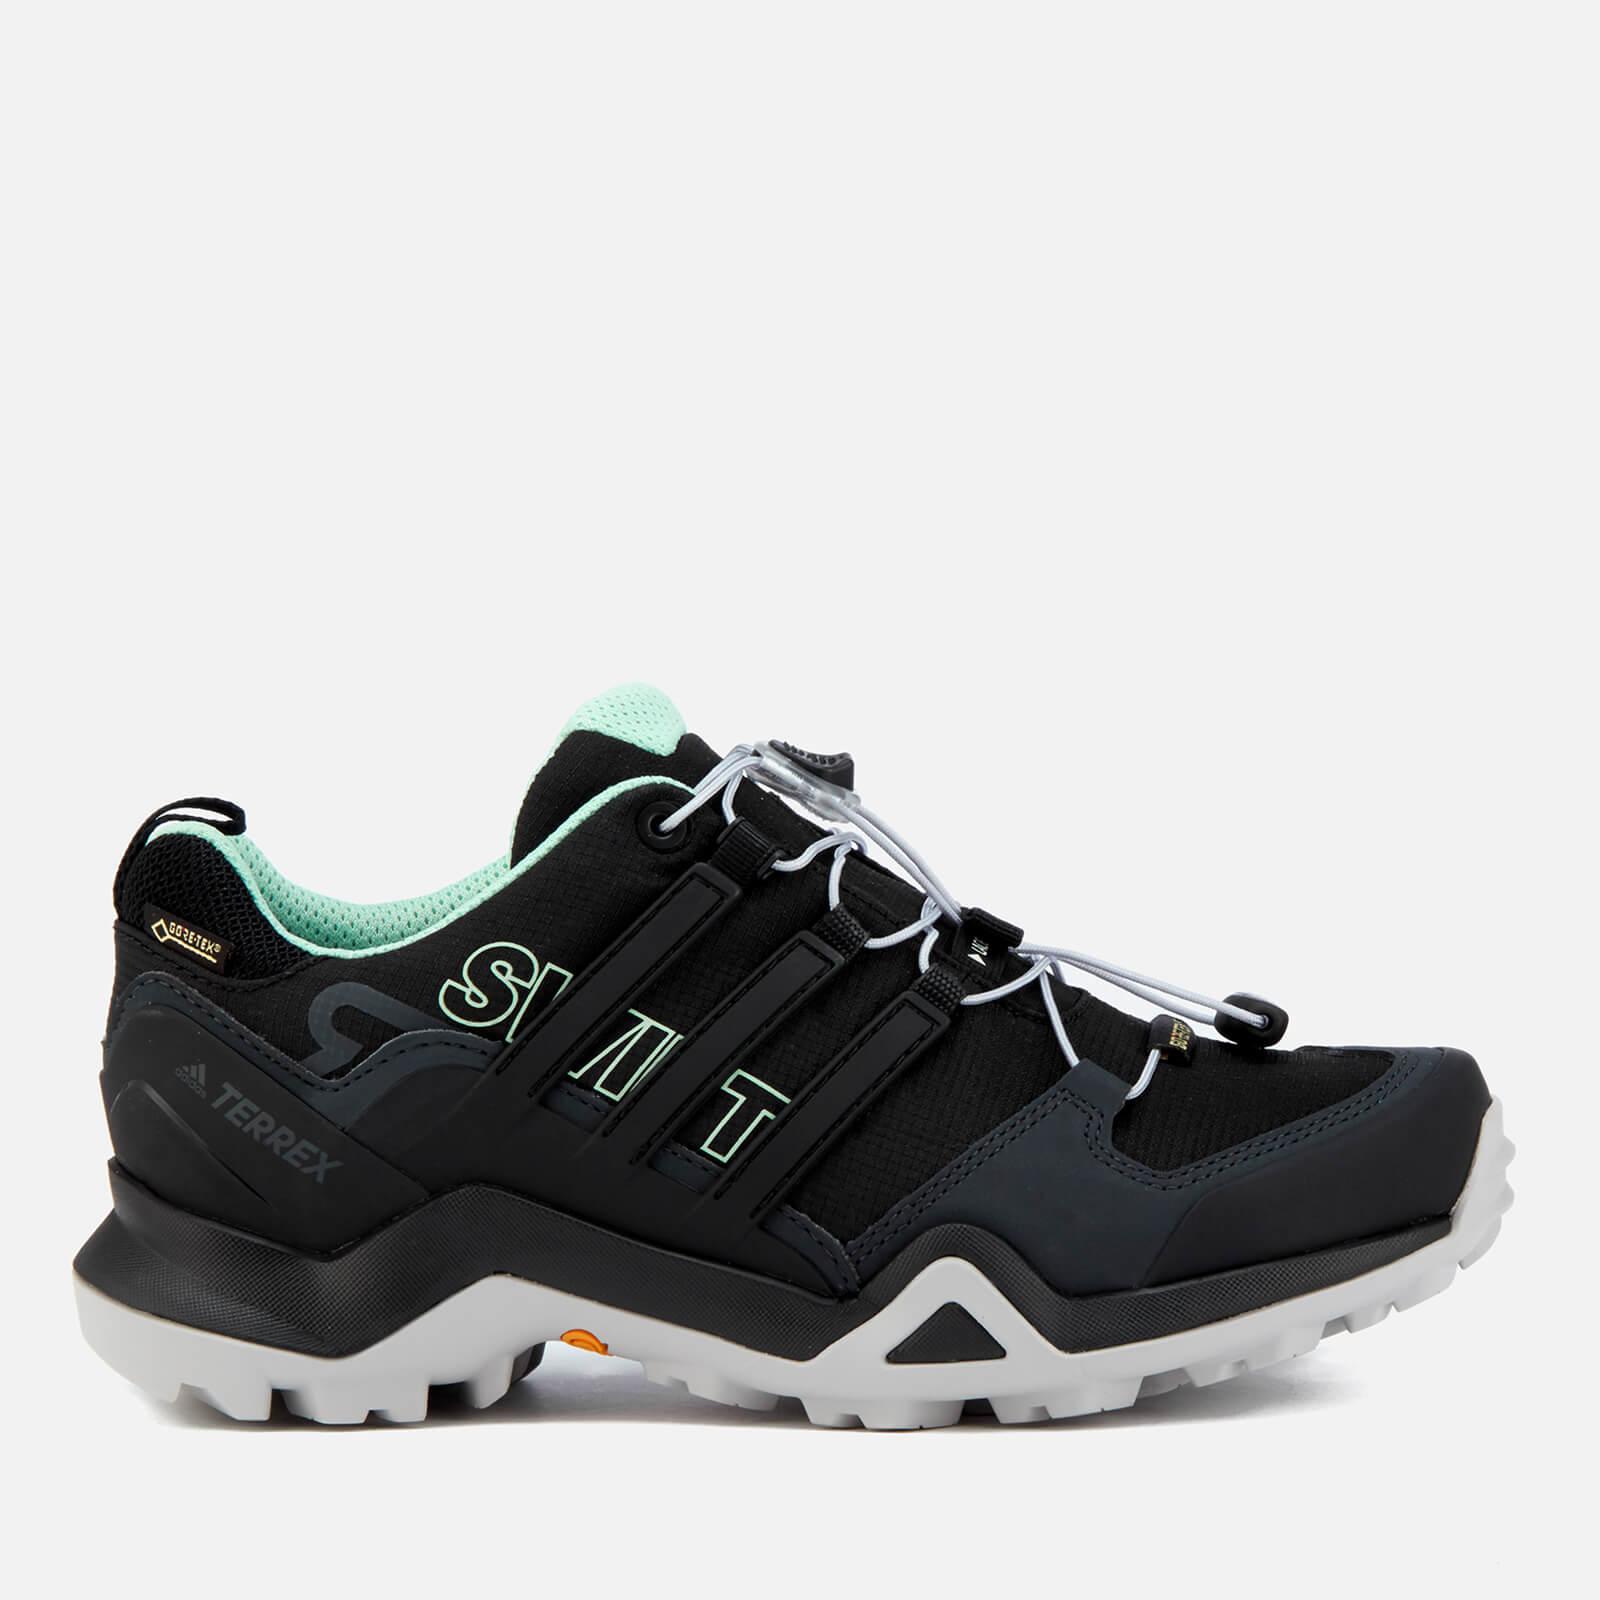 602966668b0 adidas Terrex Women's Swift R2 Gore-Tex Hiking Shoes - Core Black/Core  Black/Ash Green